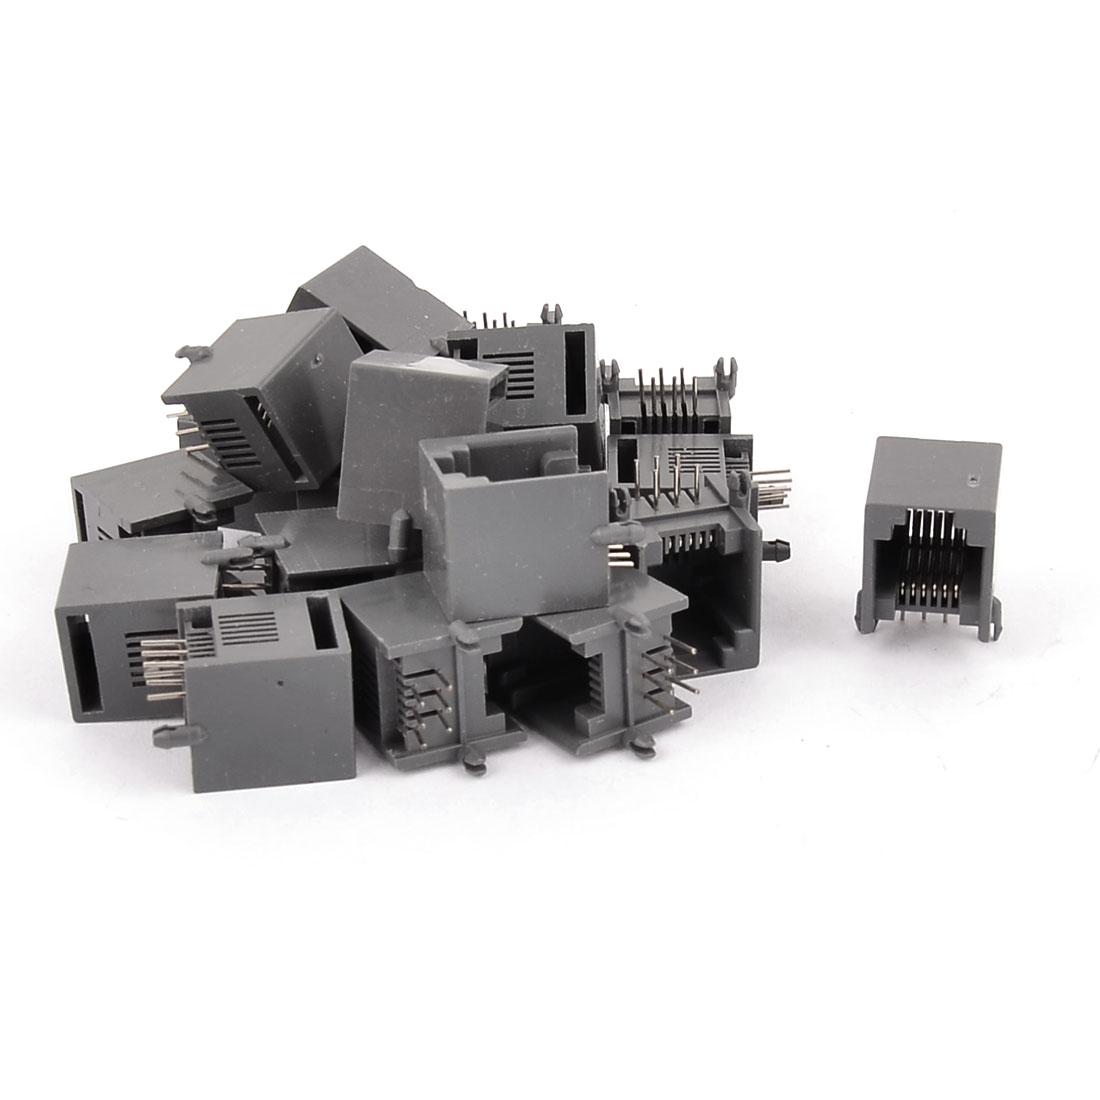 20Pcs RJ12 6P6C Computer Internet Modular Network PCB Jack Socket Gray